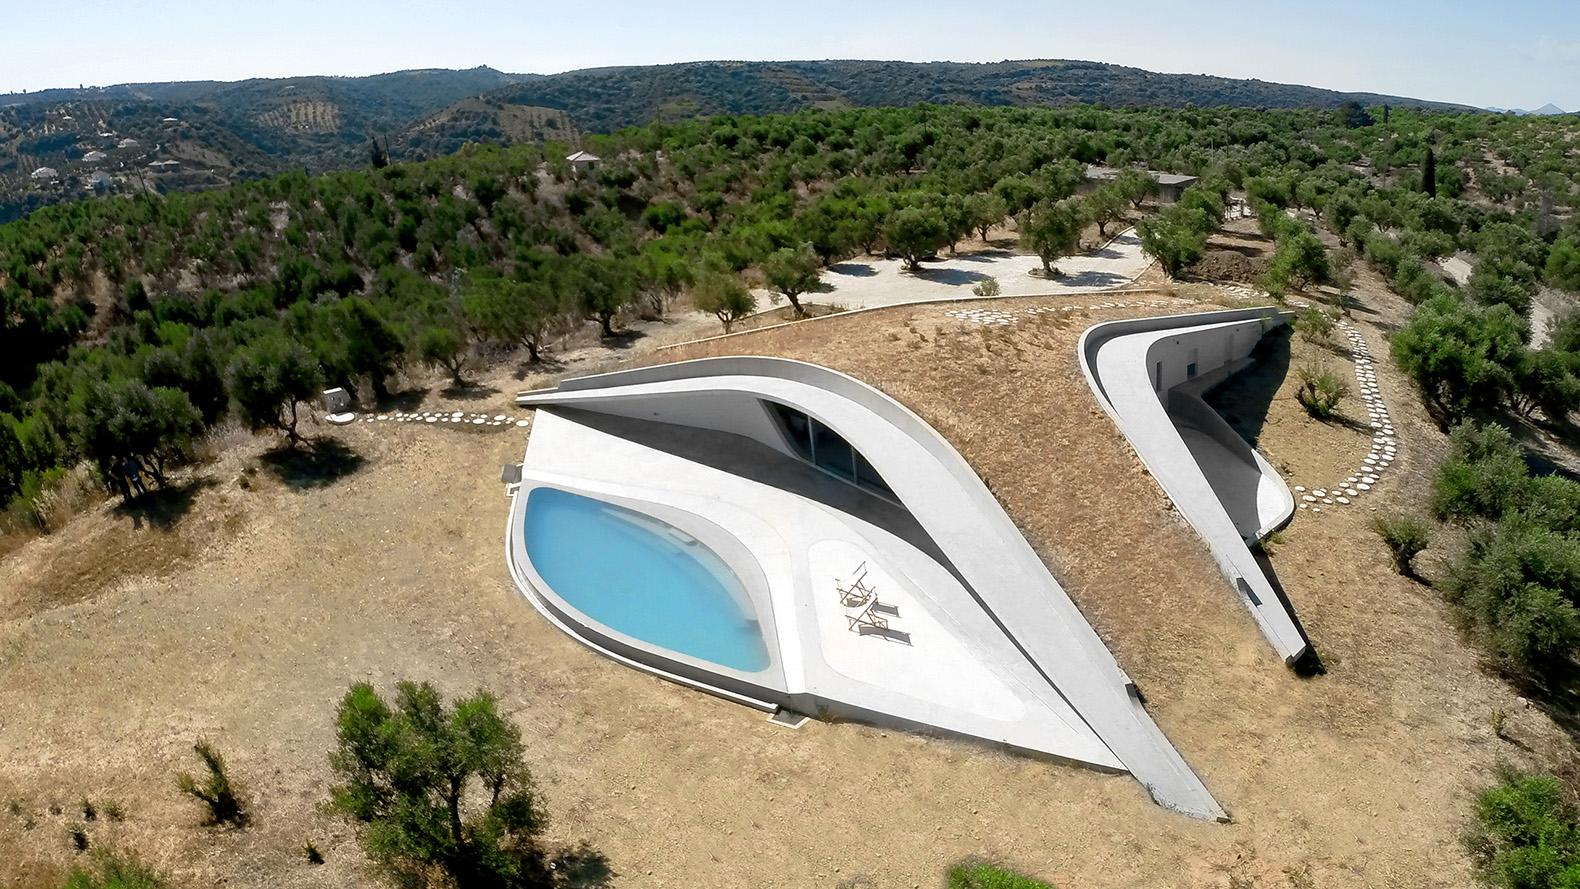 Best Kitchen Gallery: This Amazing Underground House In Greece Frames Views Of An Olive of Underground Concrete Homes on rachelxblog.com